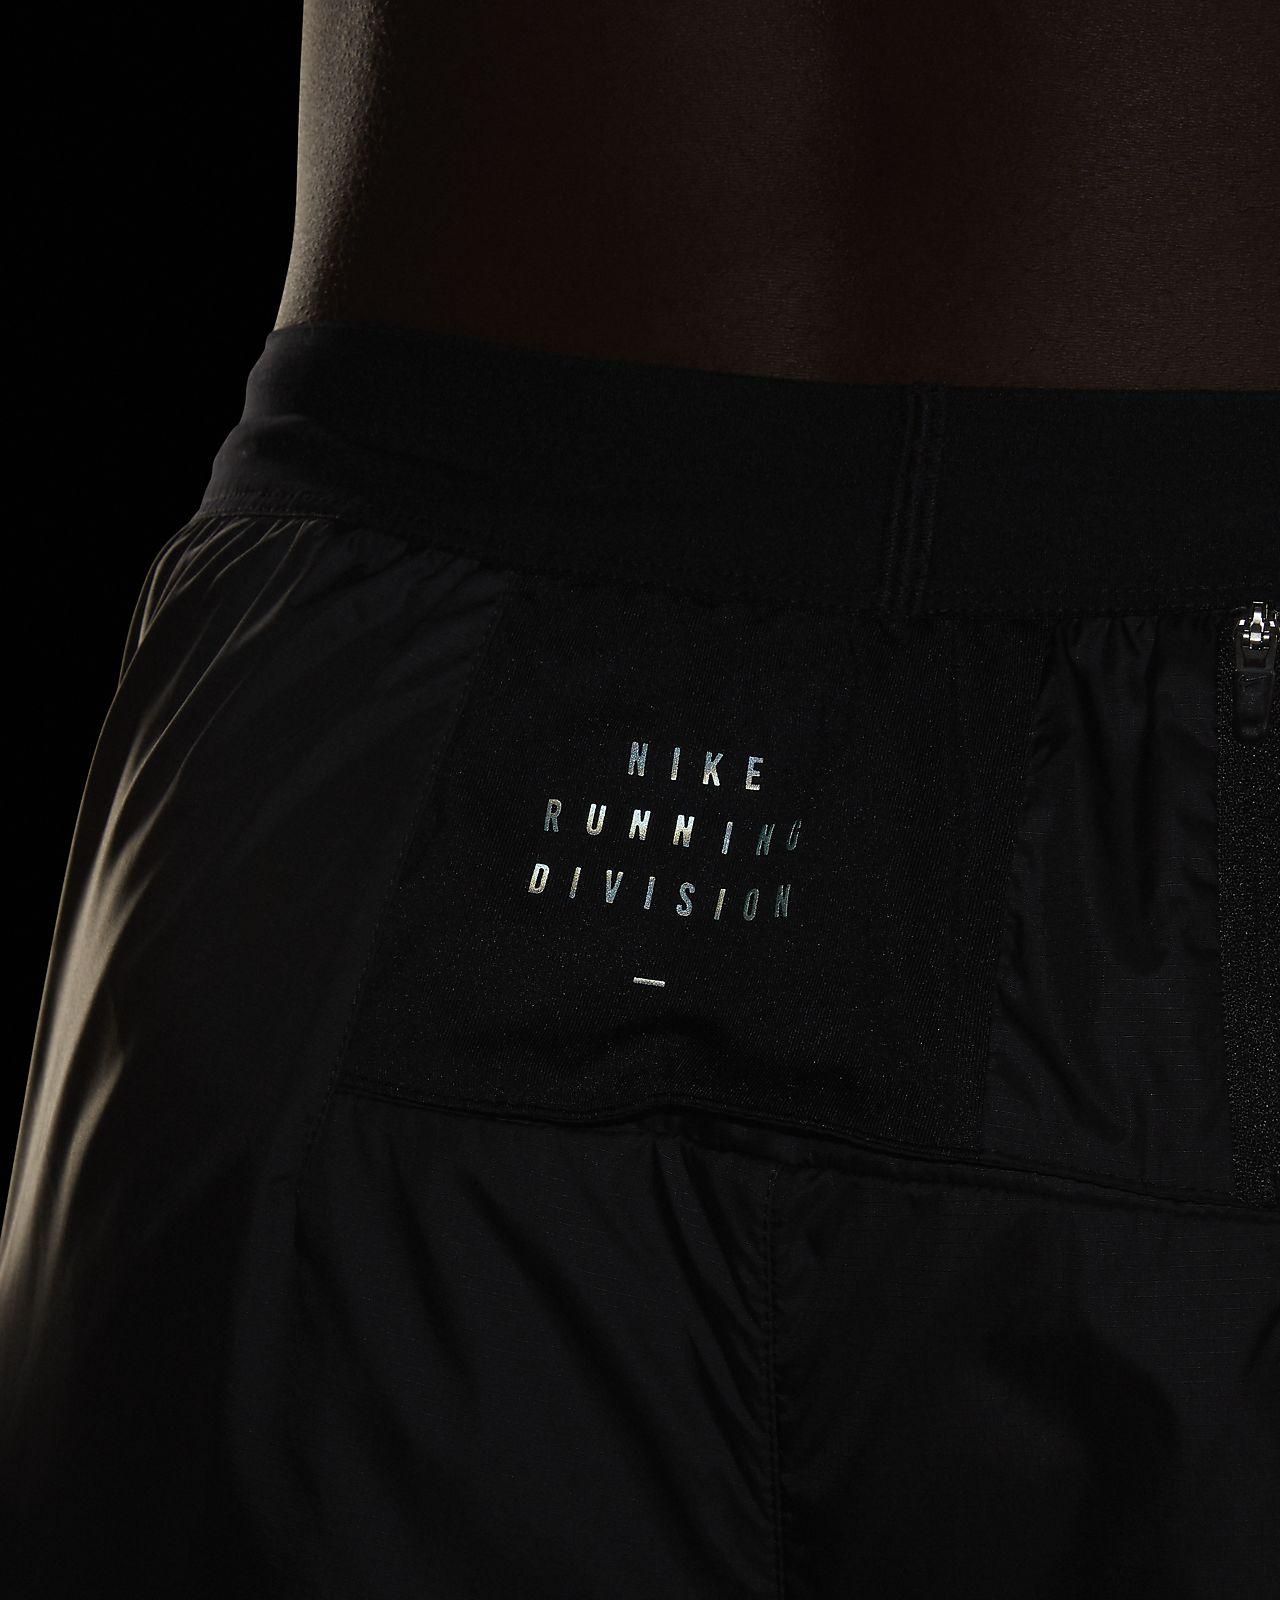 promo code 23370 e6297 ... Löparbyxor Nike Run Division Tech för män